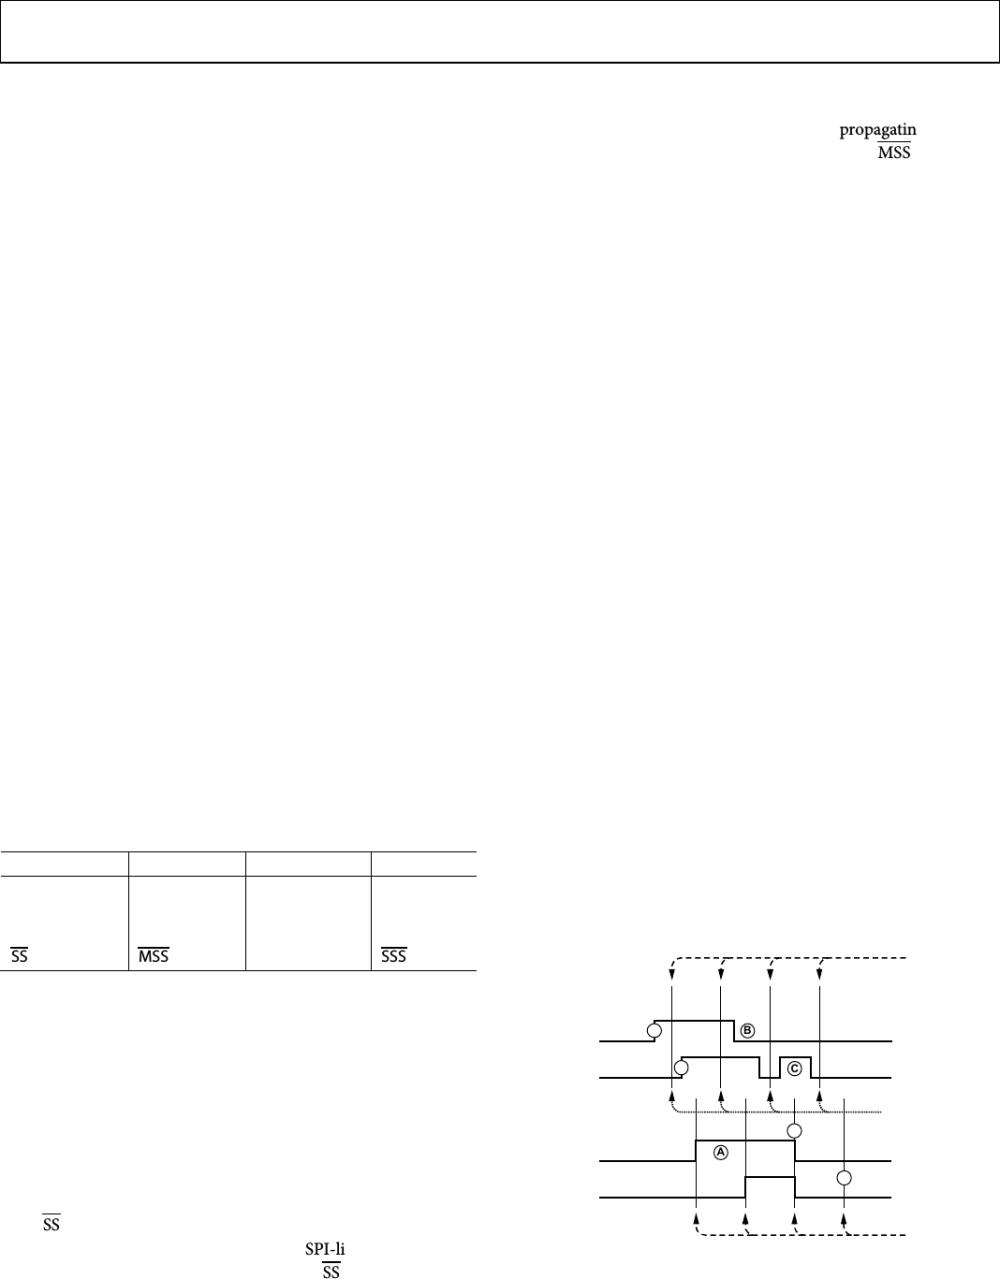 medium resolution of adum3151 adum3152 adum3153 data sheet